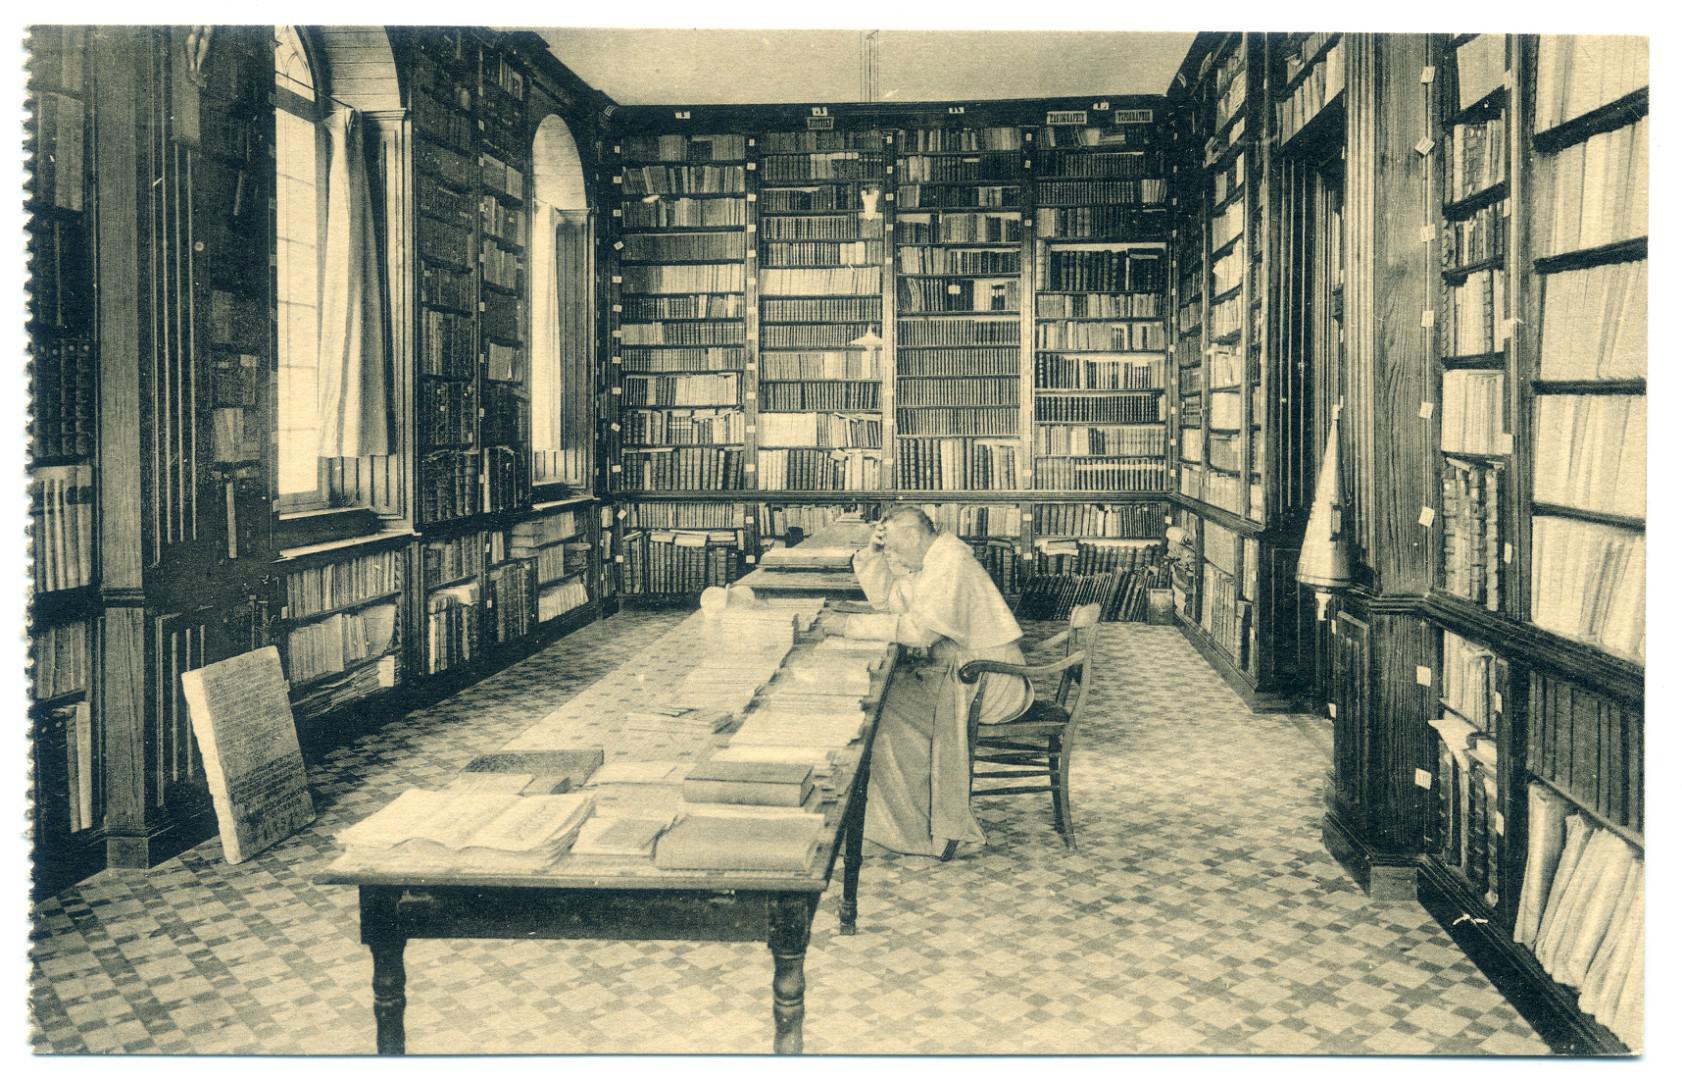 Abtei Grimbergen, Bibliothek